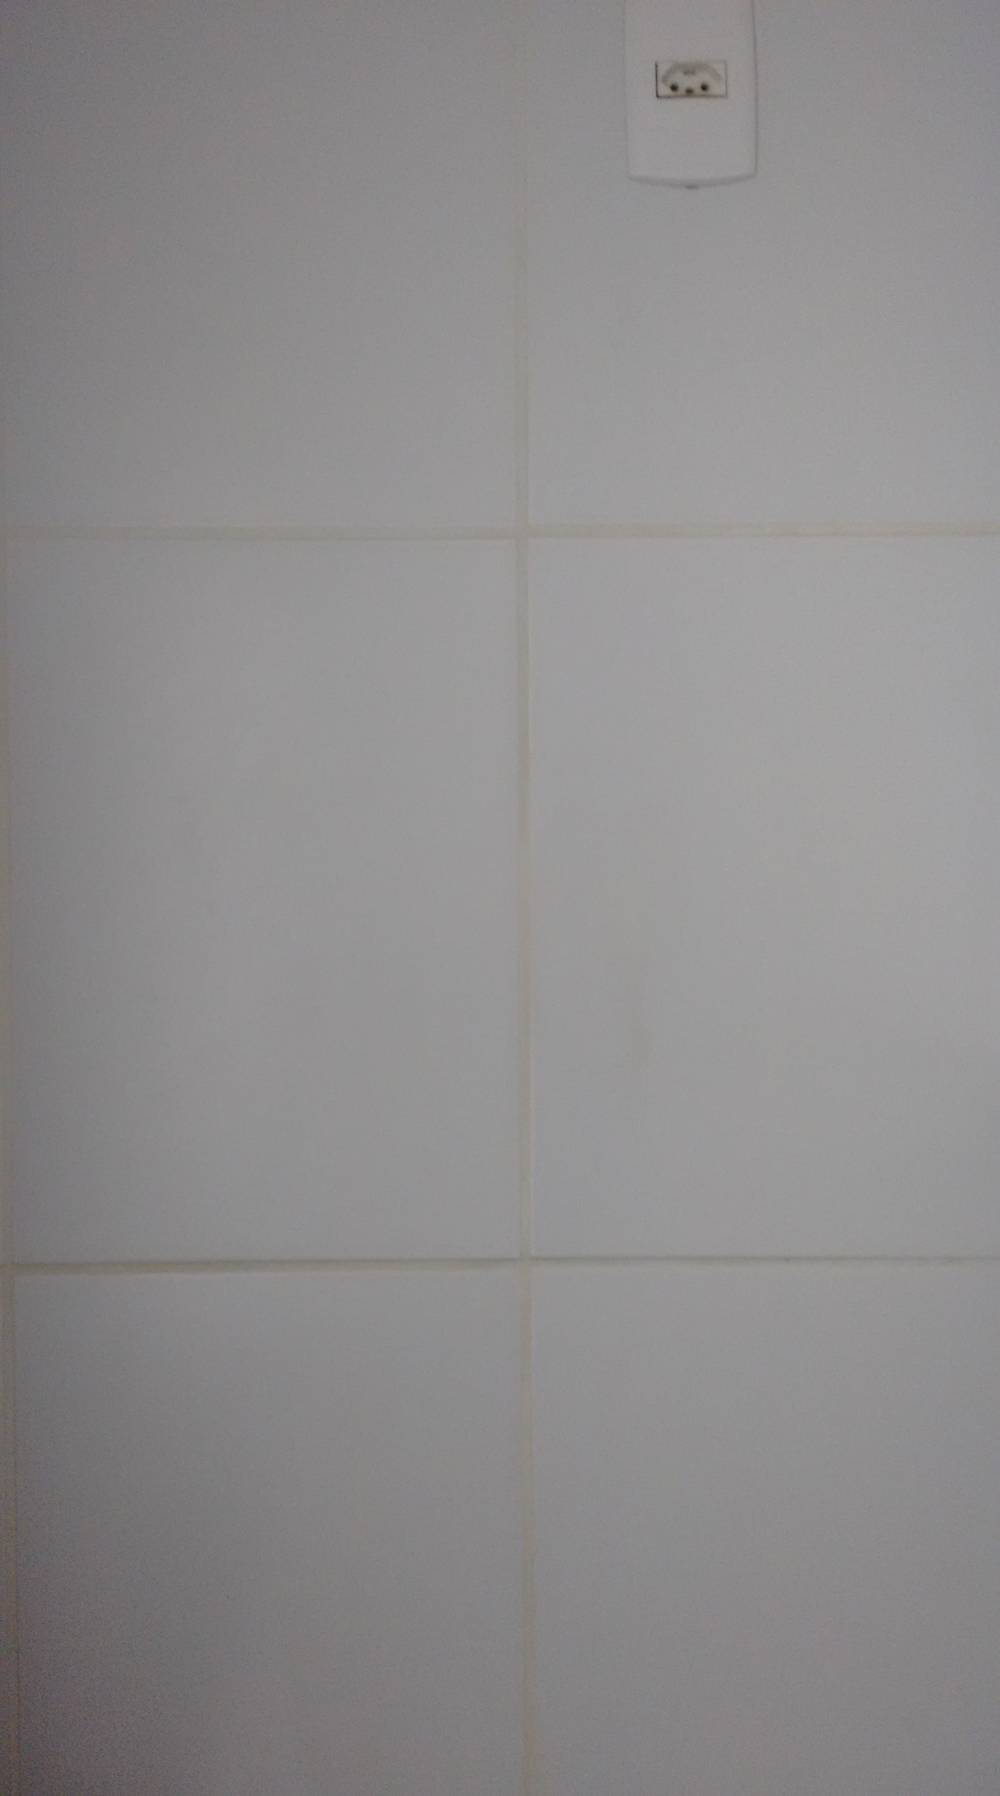 Valores de Reparo Residencial no Sítio dos Vianas - Reparos Domésticos